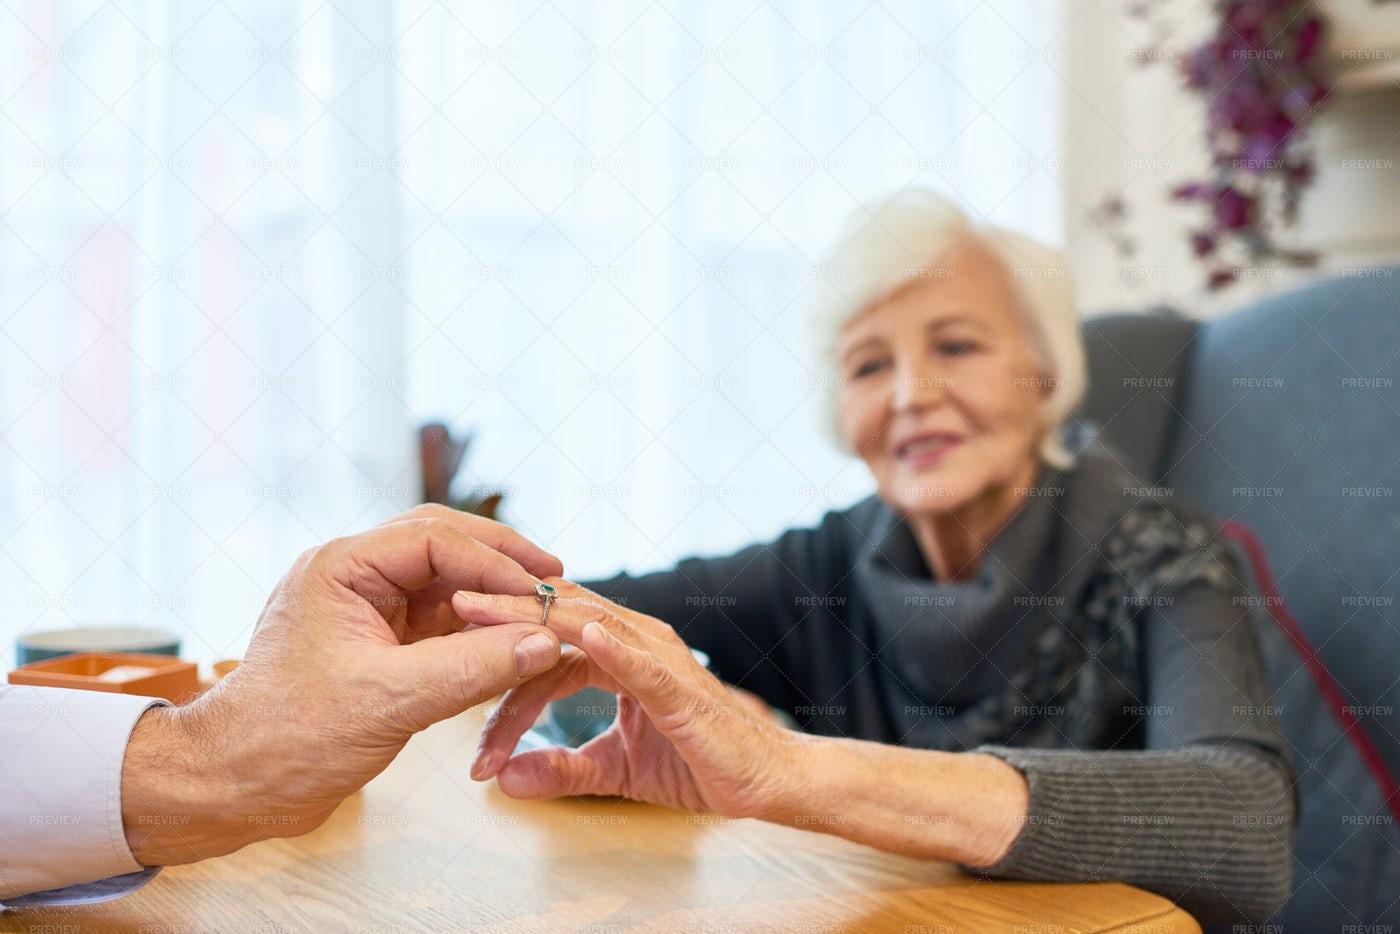 Engagement Of Loving Senior Couple: Stock Photos